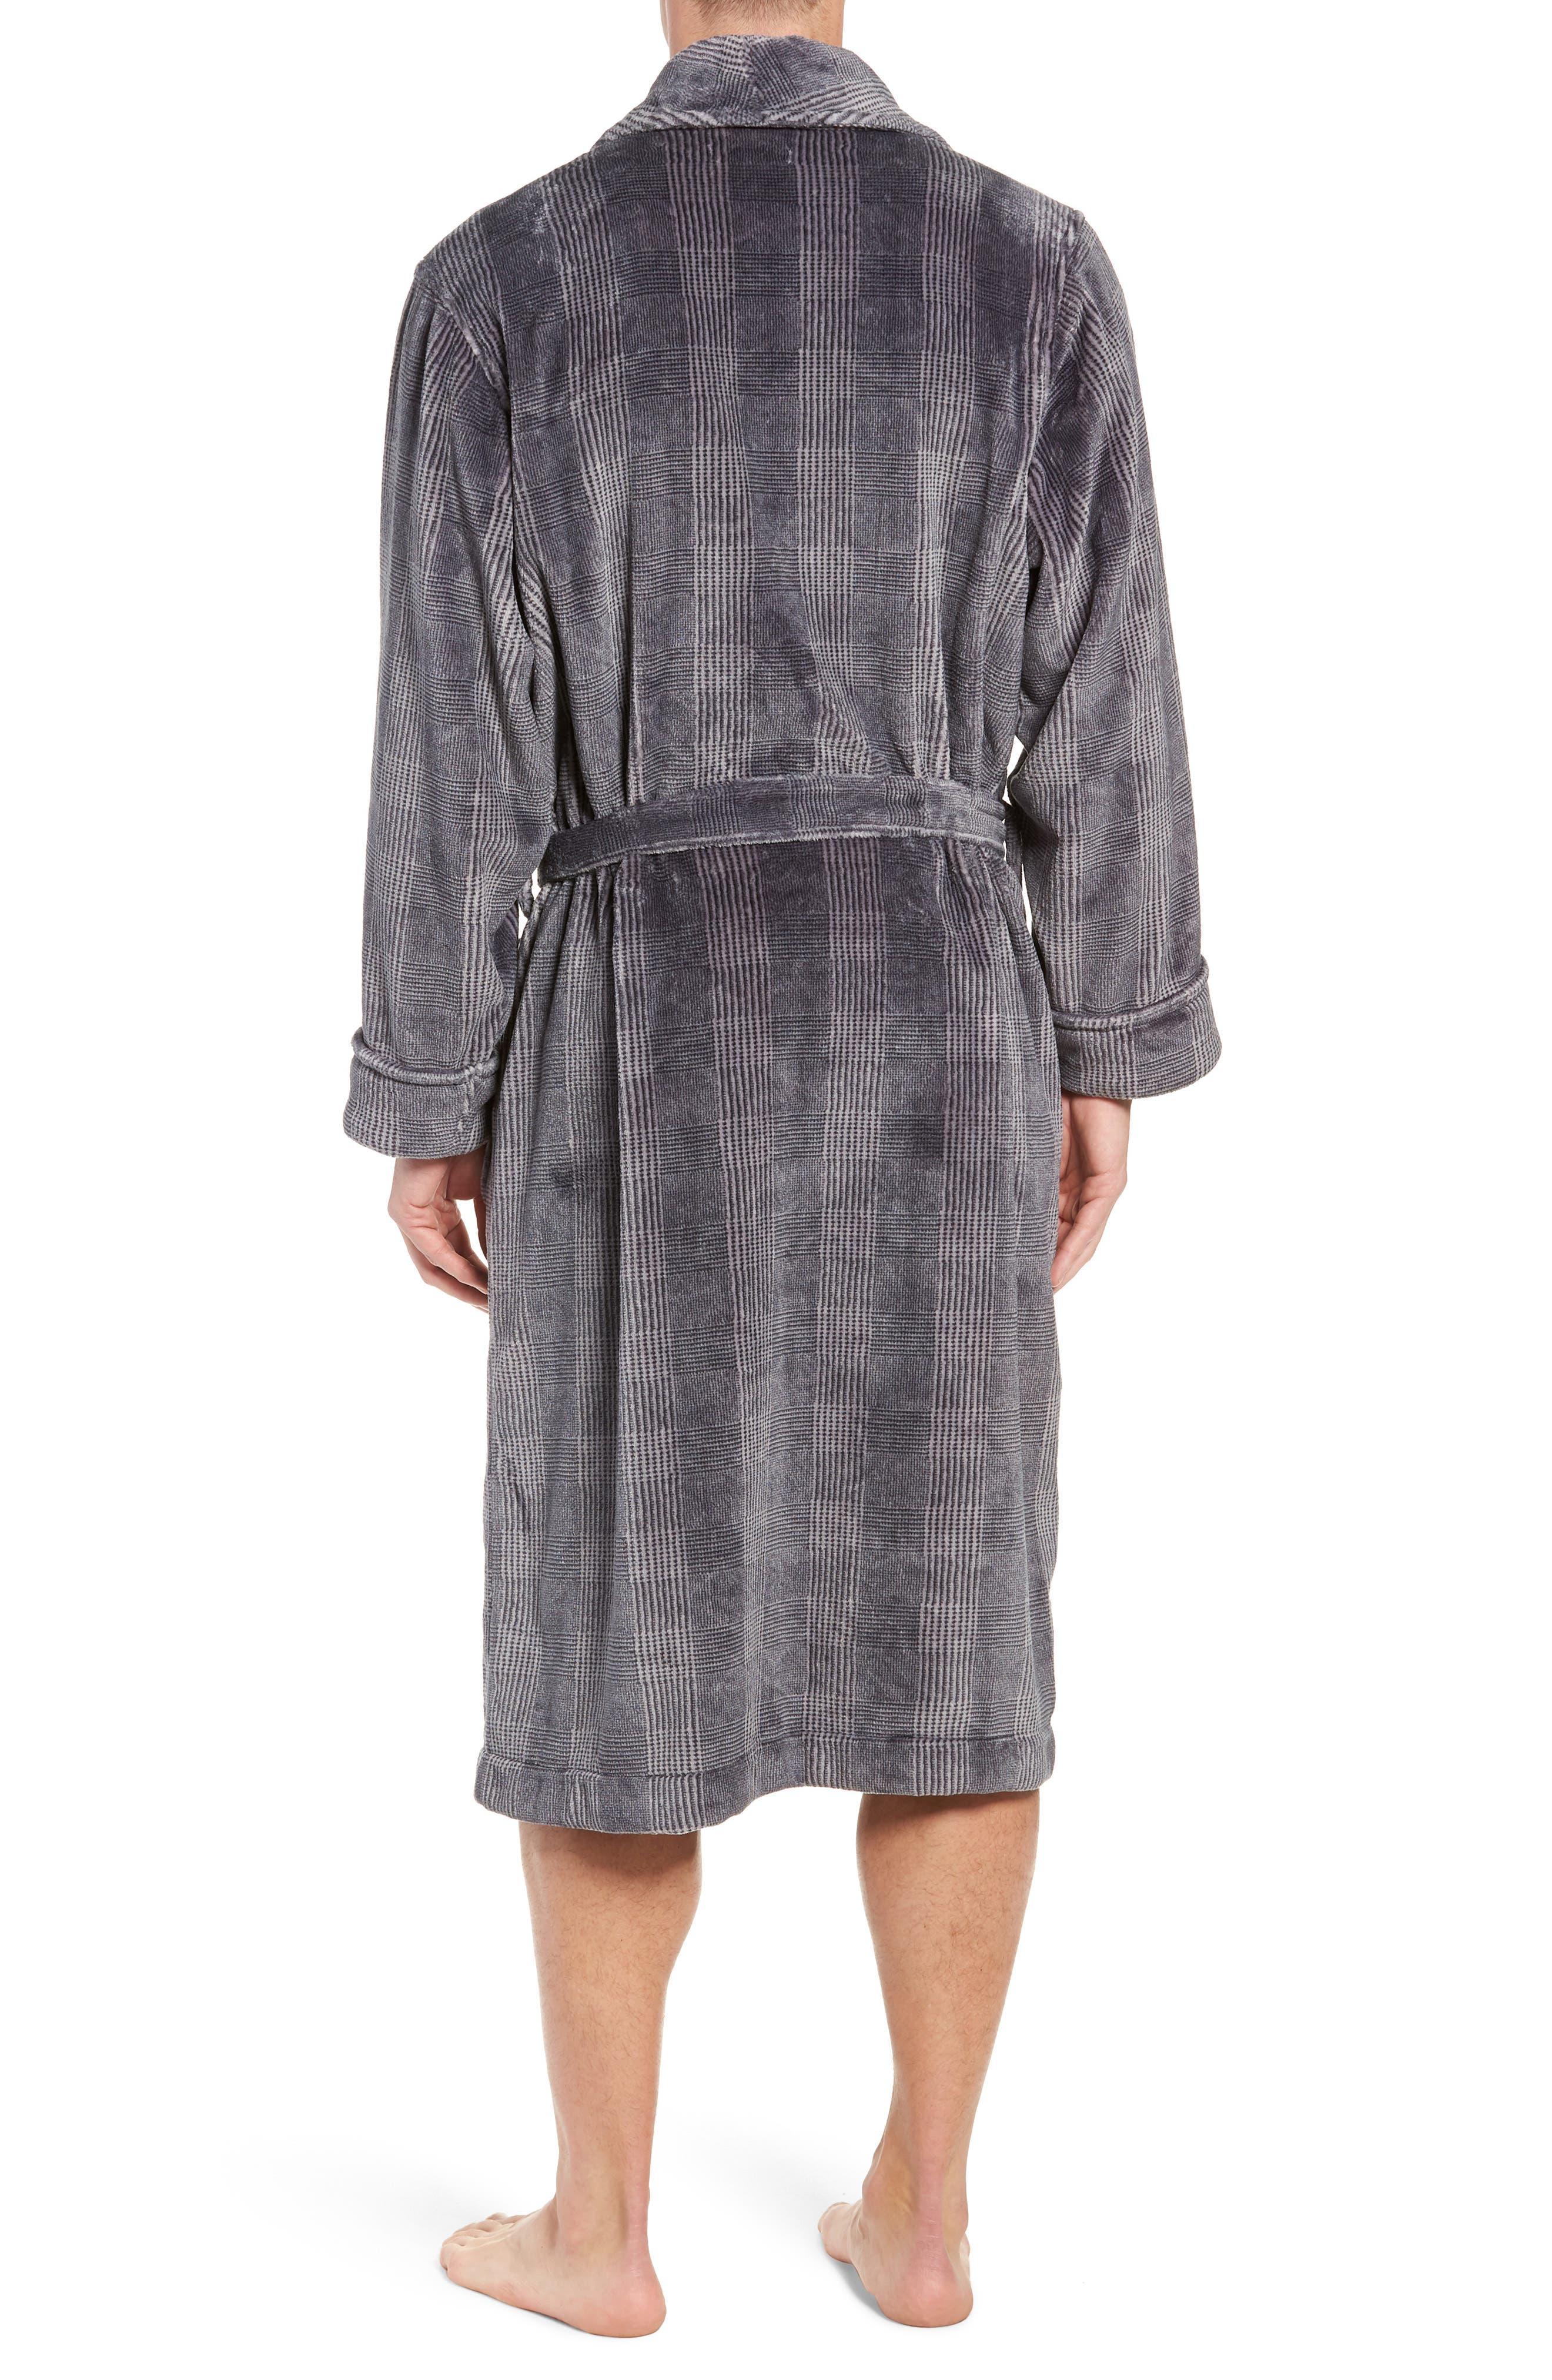 Glen Check Fleece Robe,                             Alternate thumbnail 2, color,                             BLACK - CHARCOAL GLEN CHECK